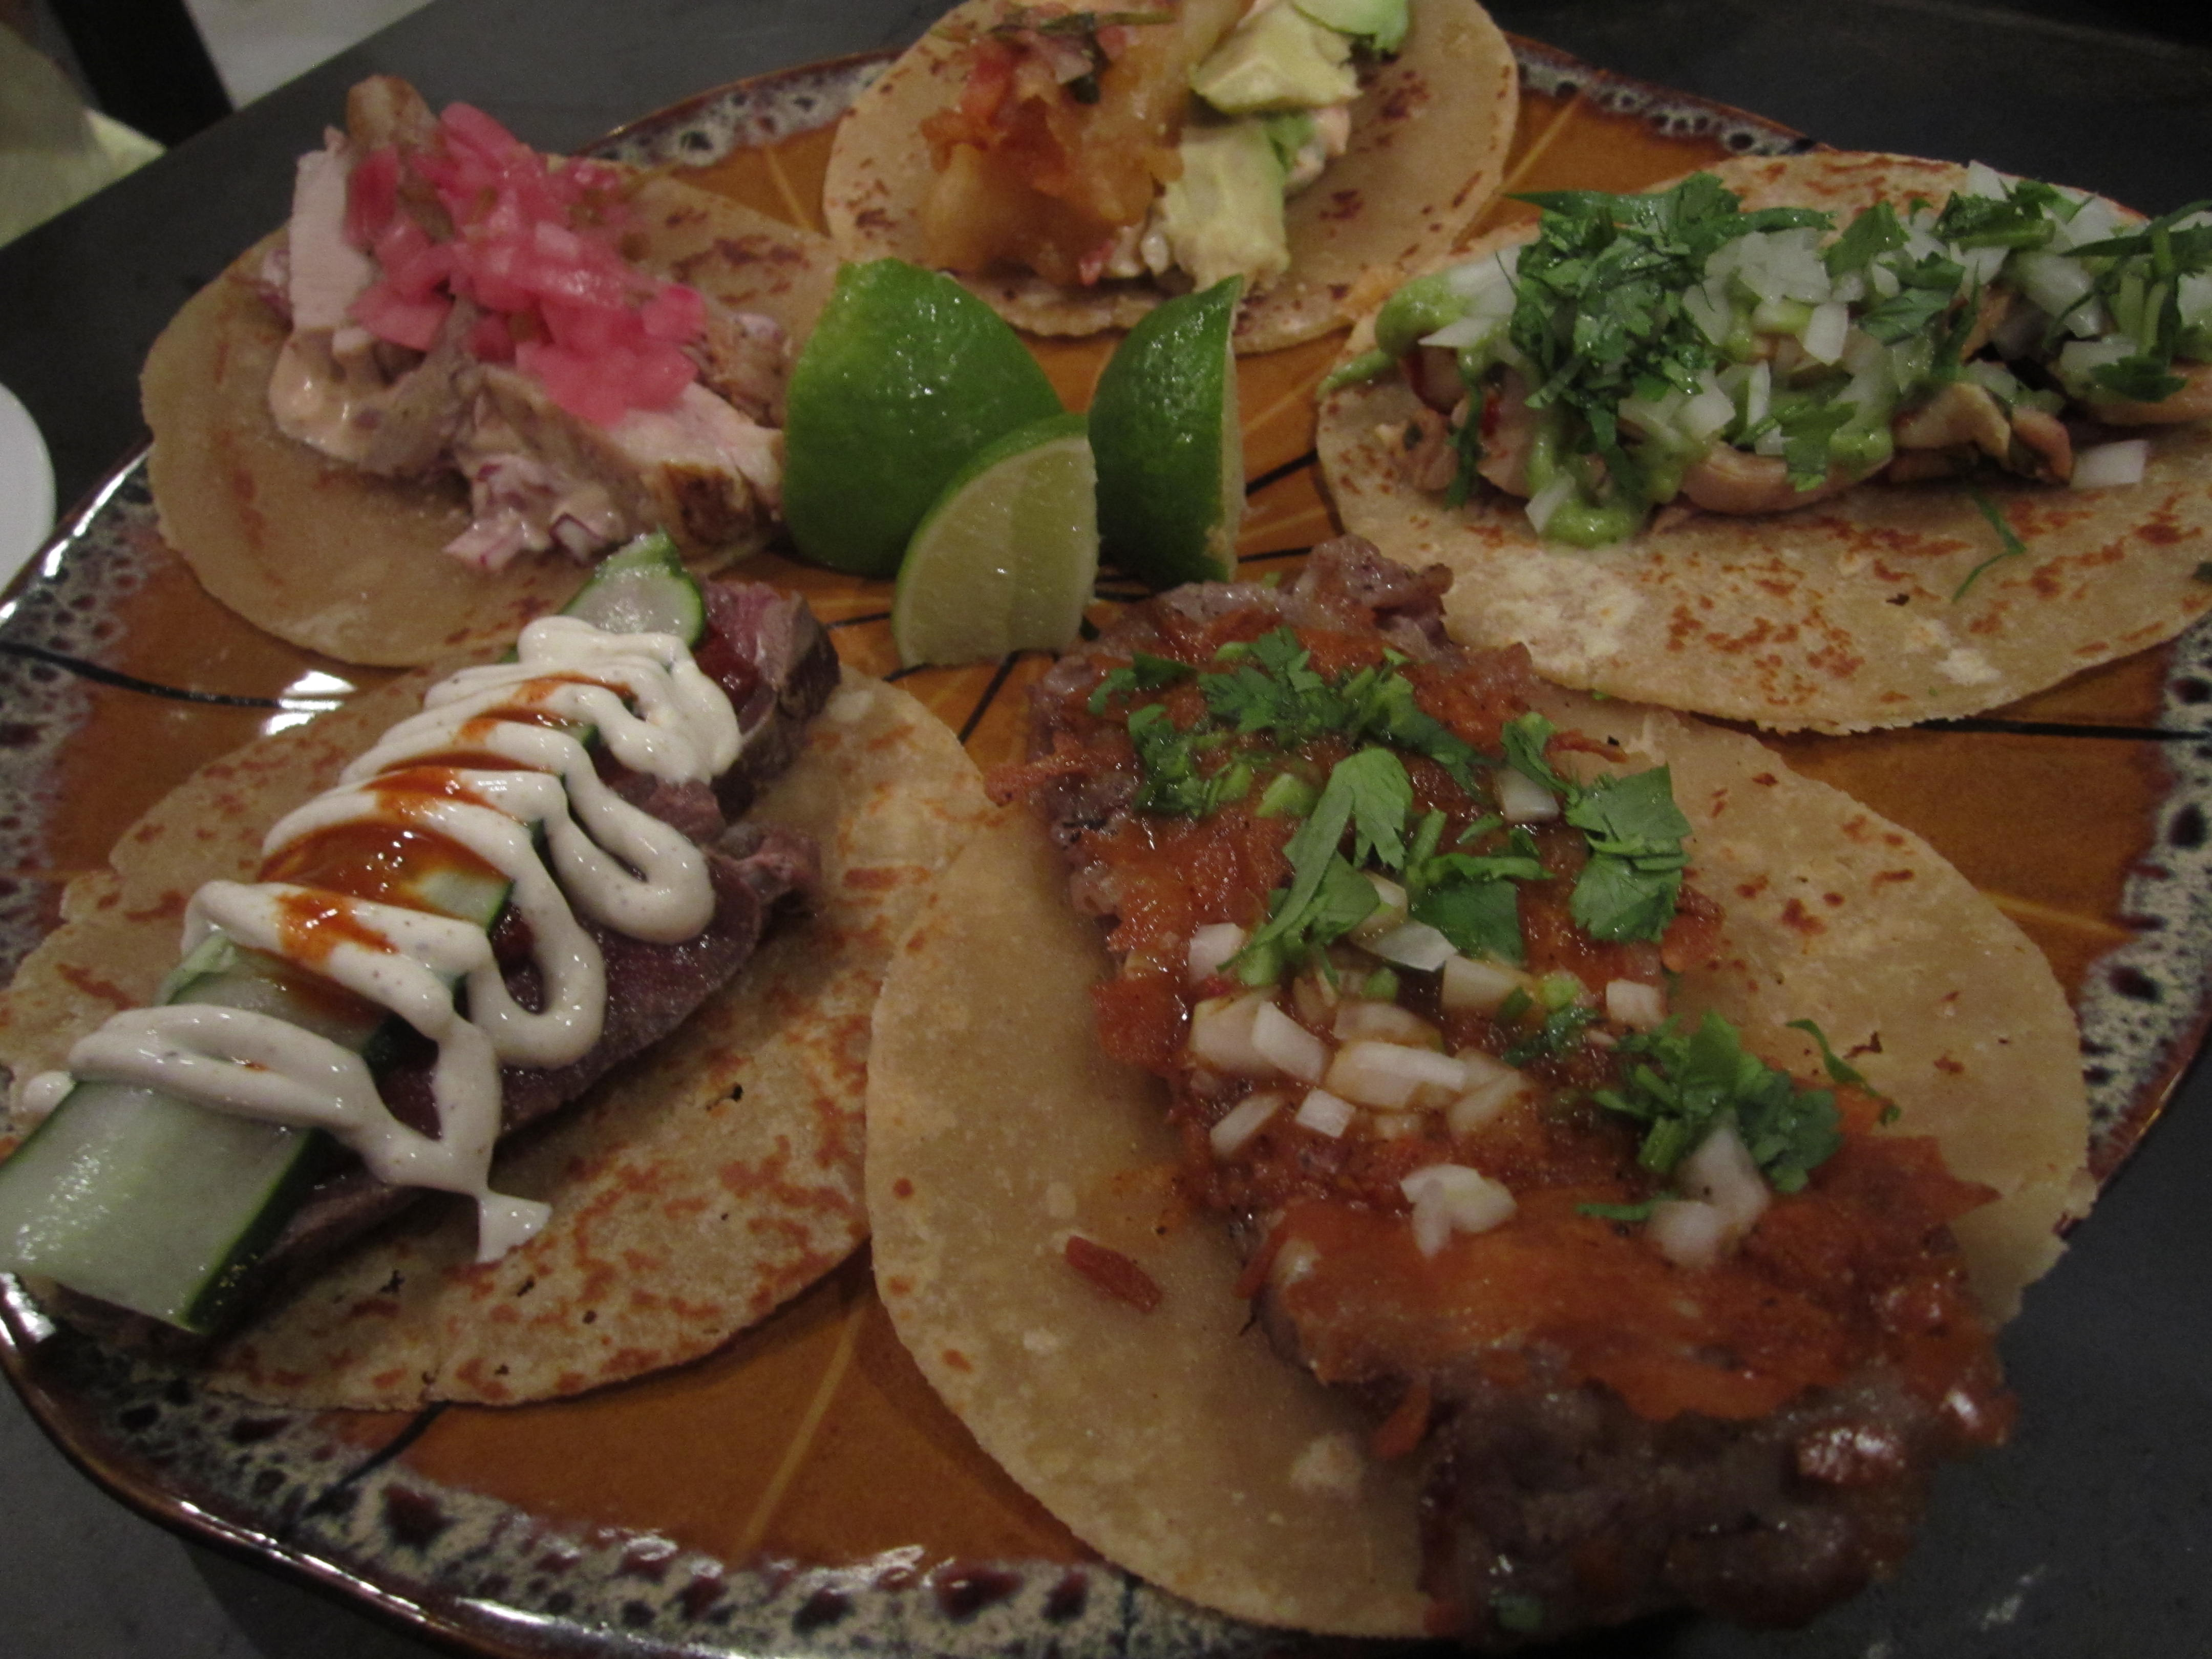 Brickhouse tacos